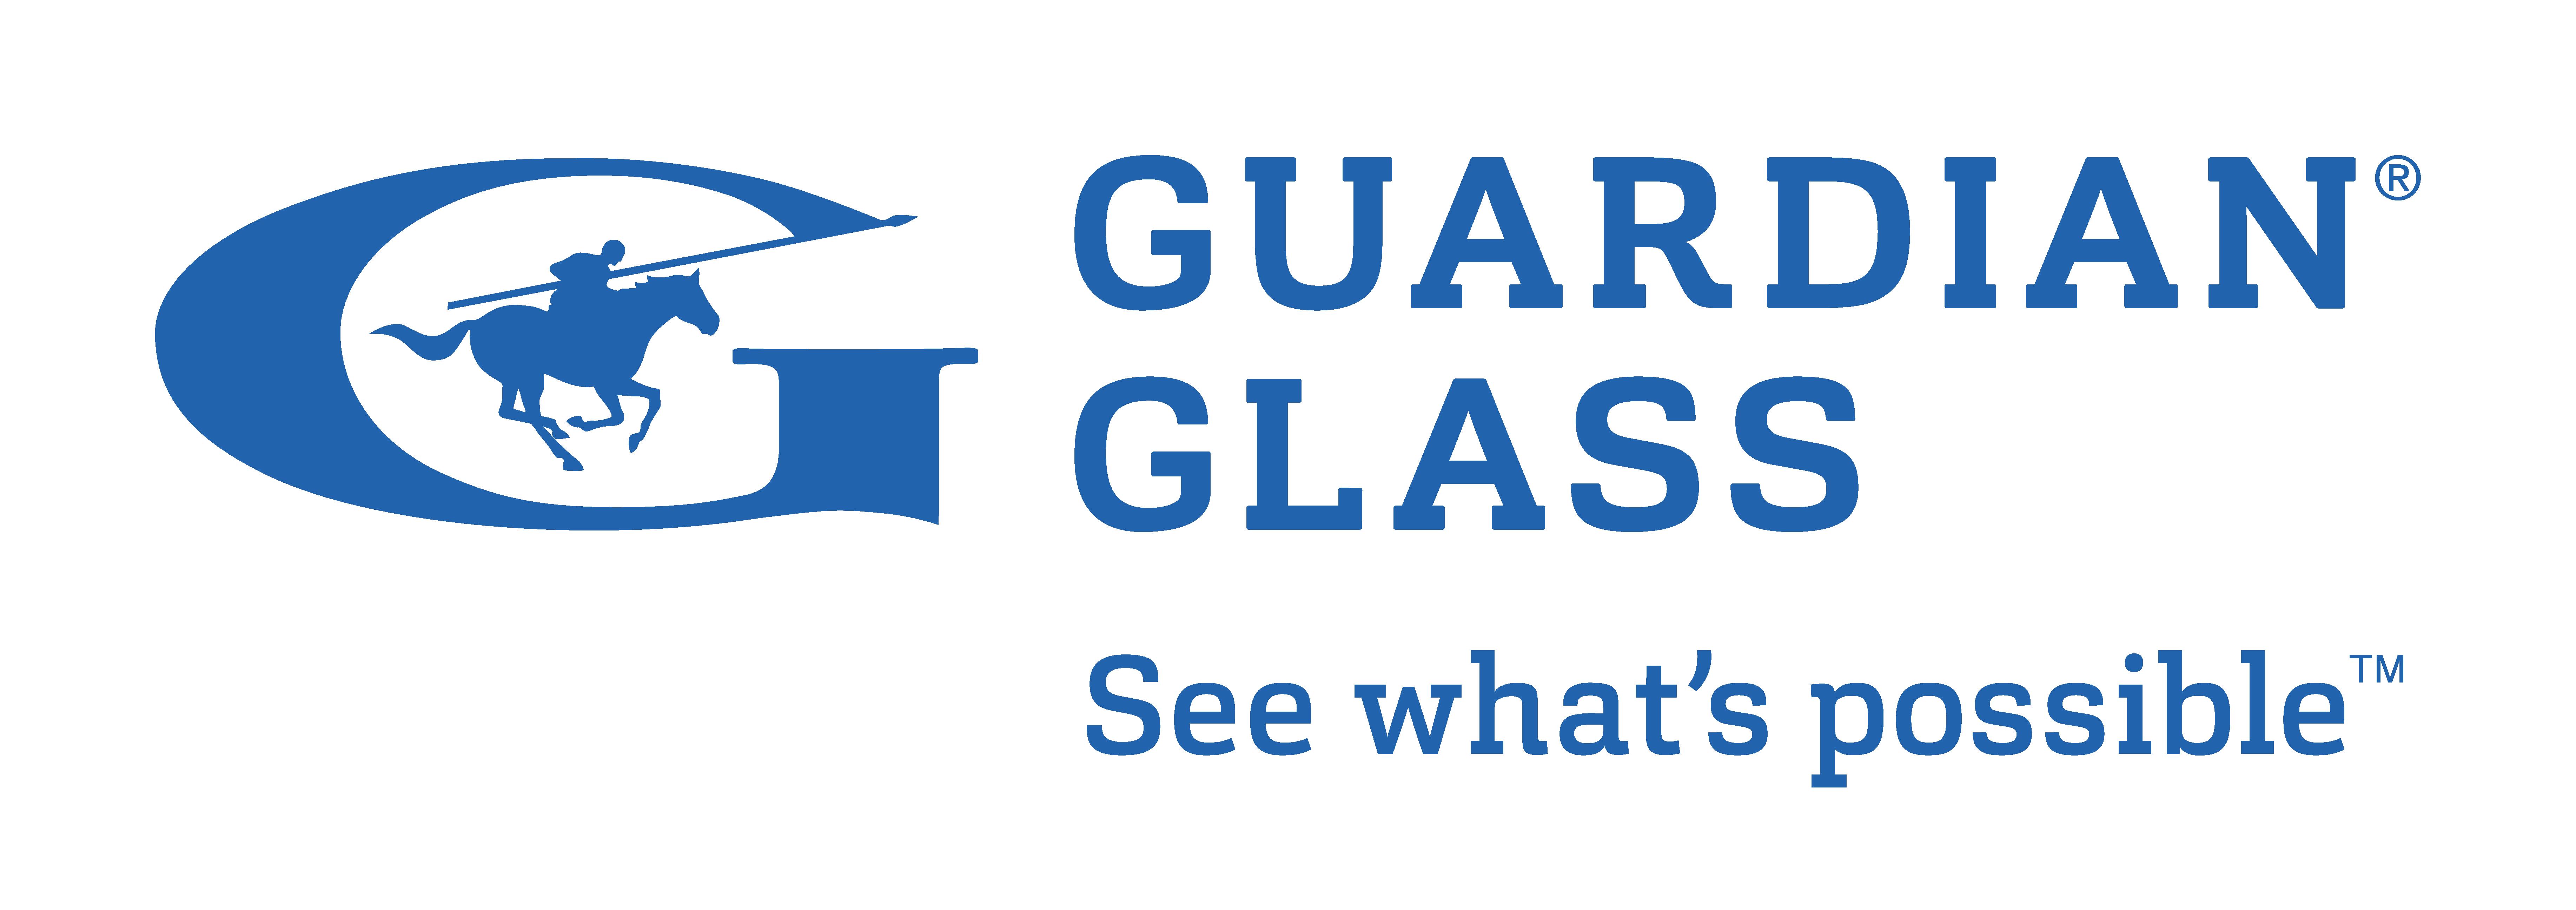 Guardian Glass